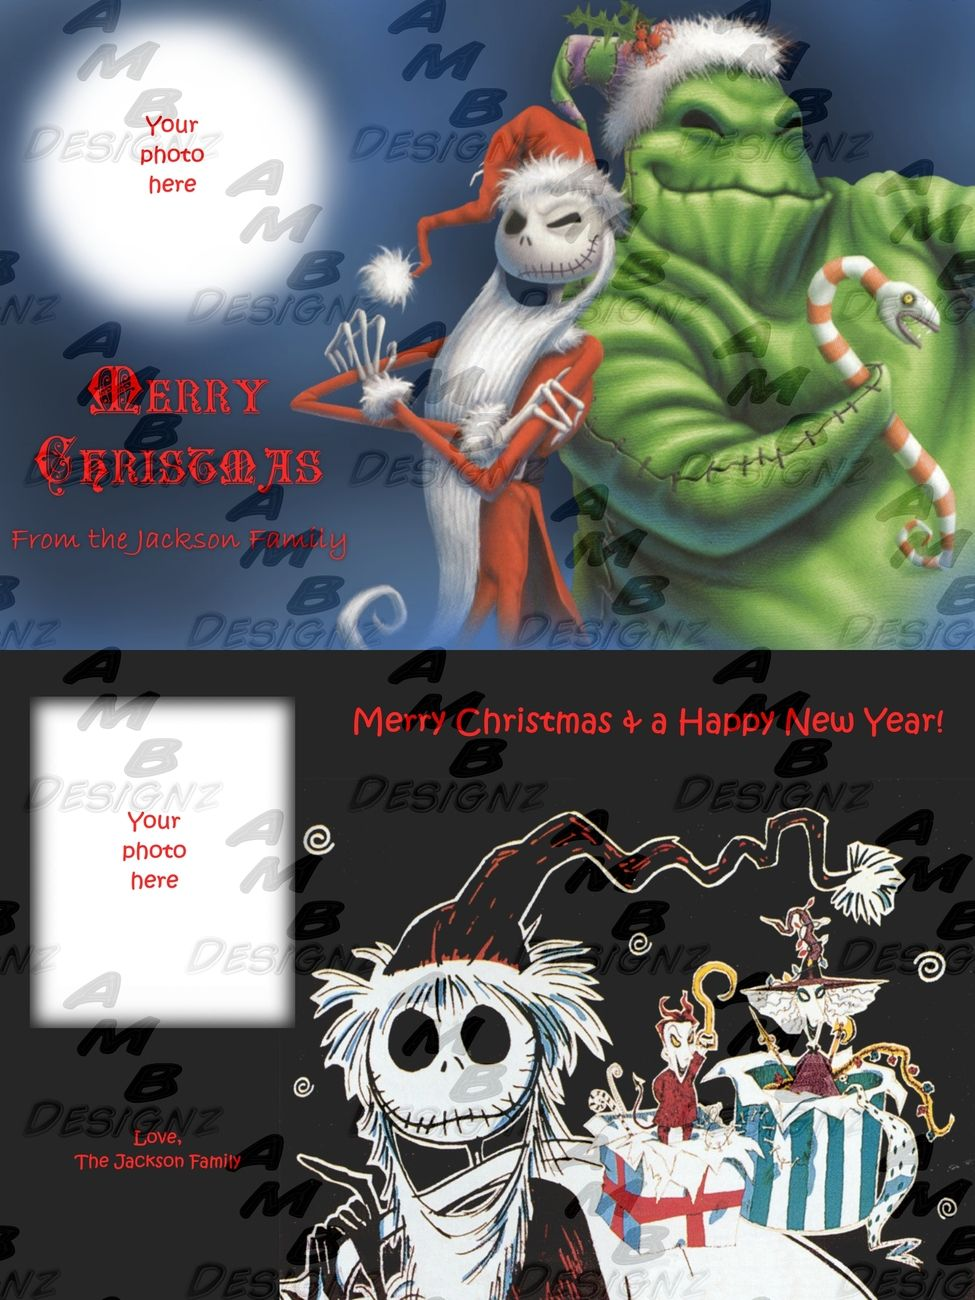 The Nightmare Before Christmas Custom Christmas Greeting Cards For